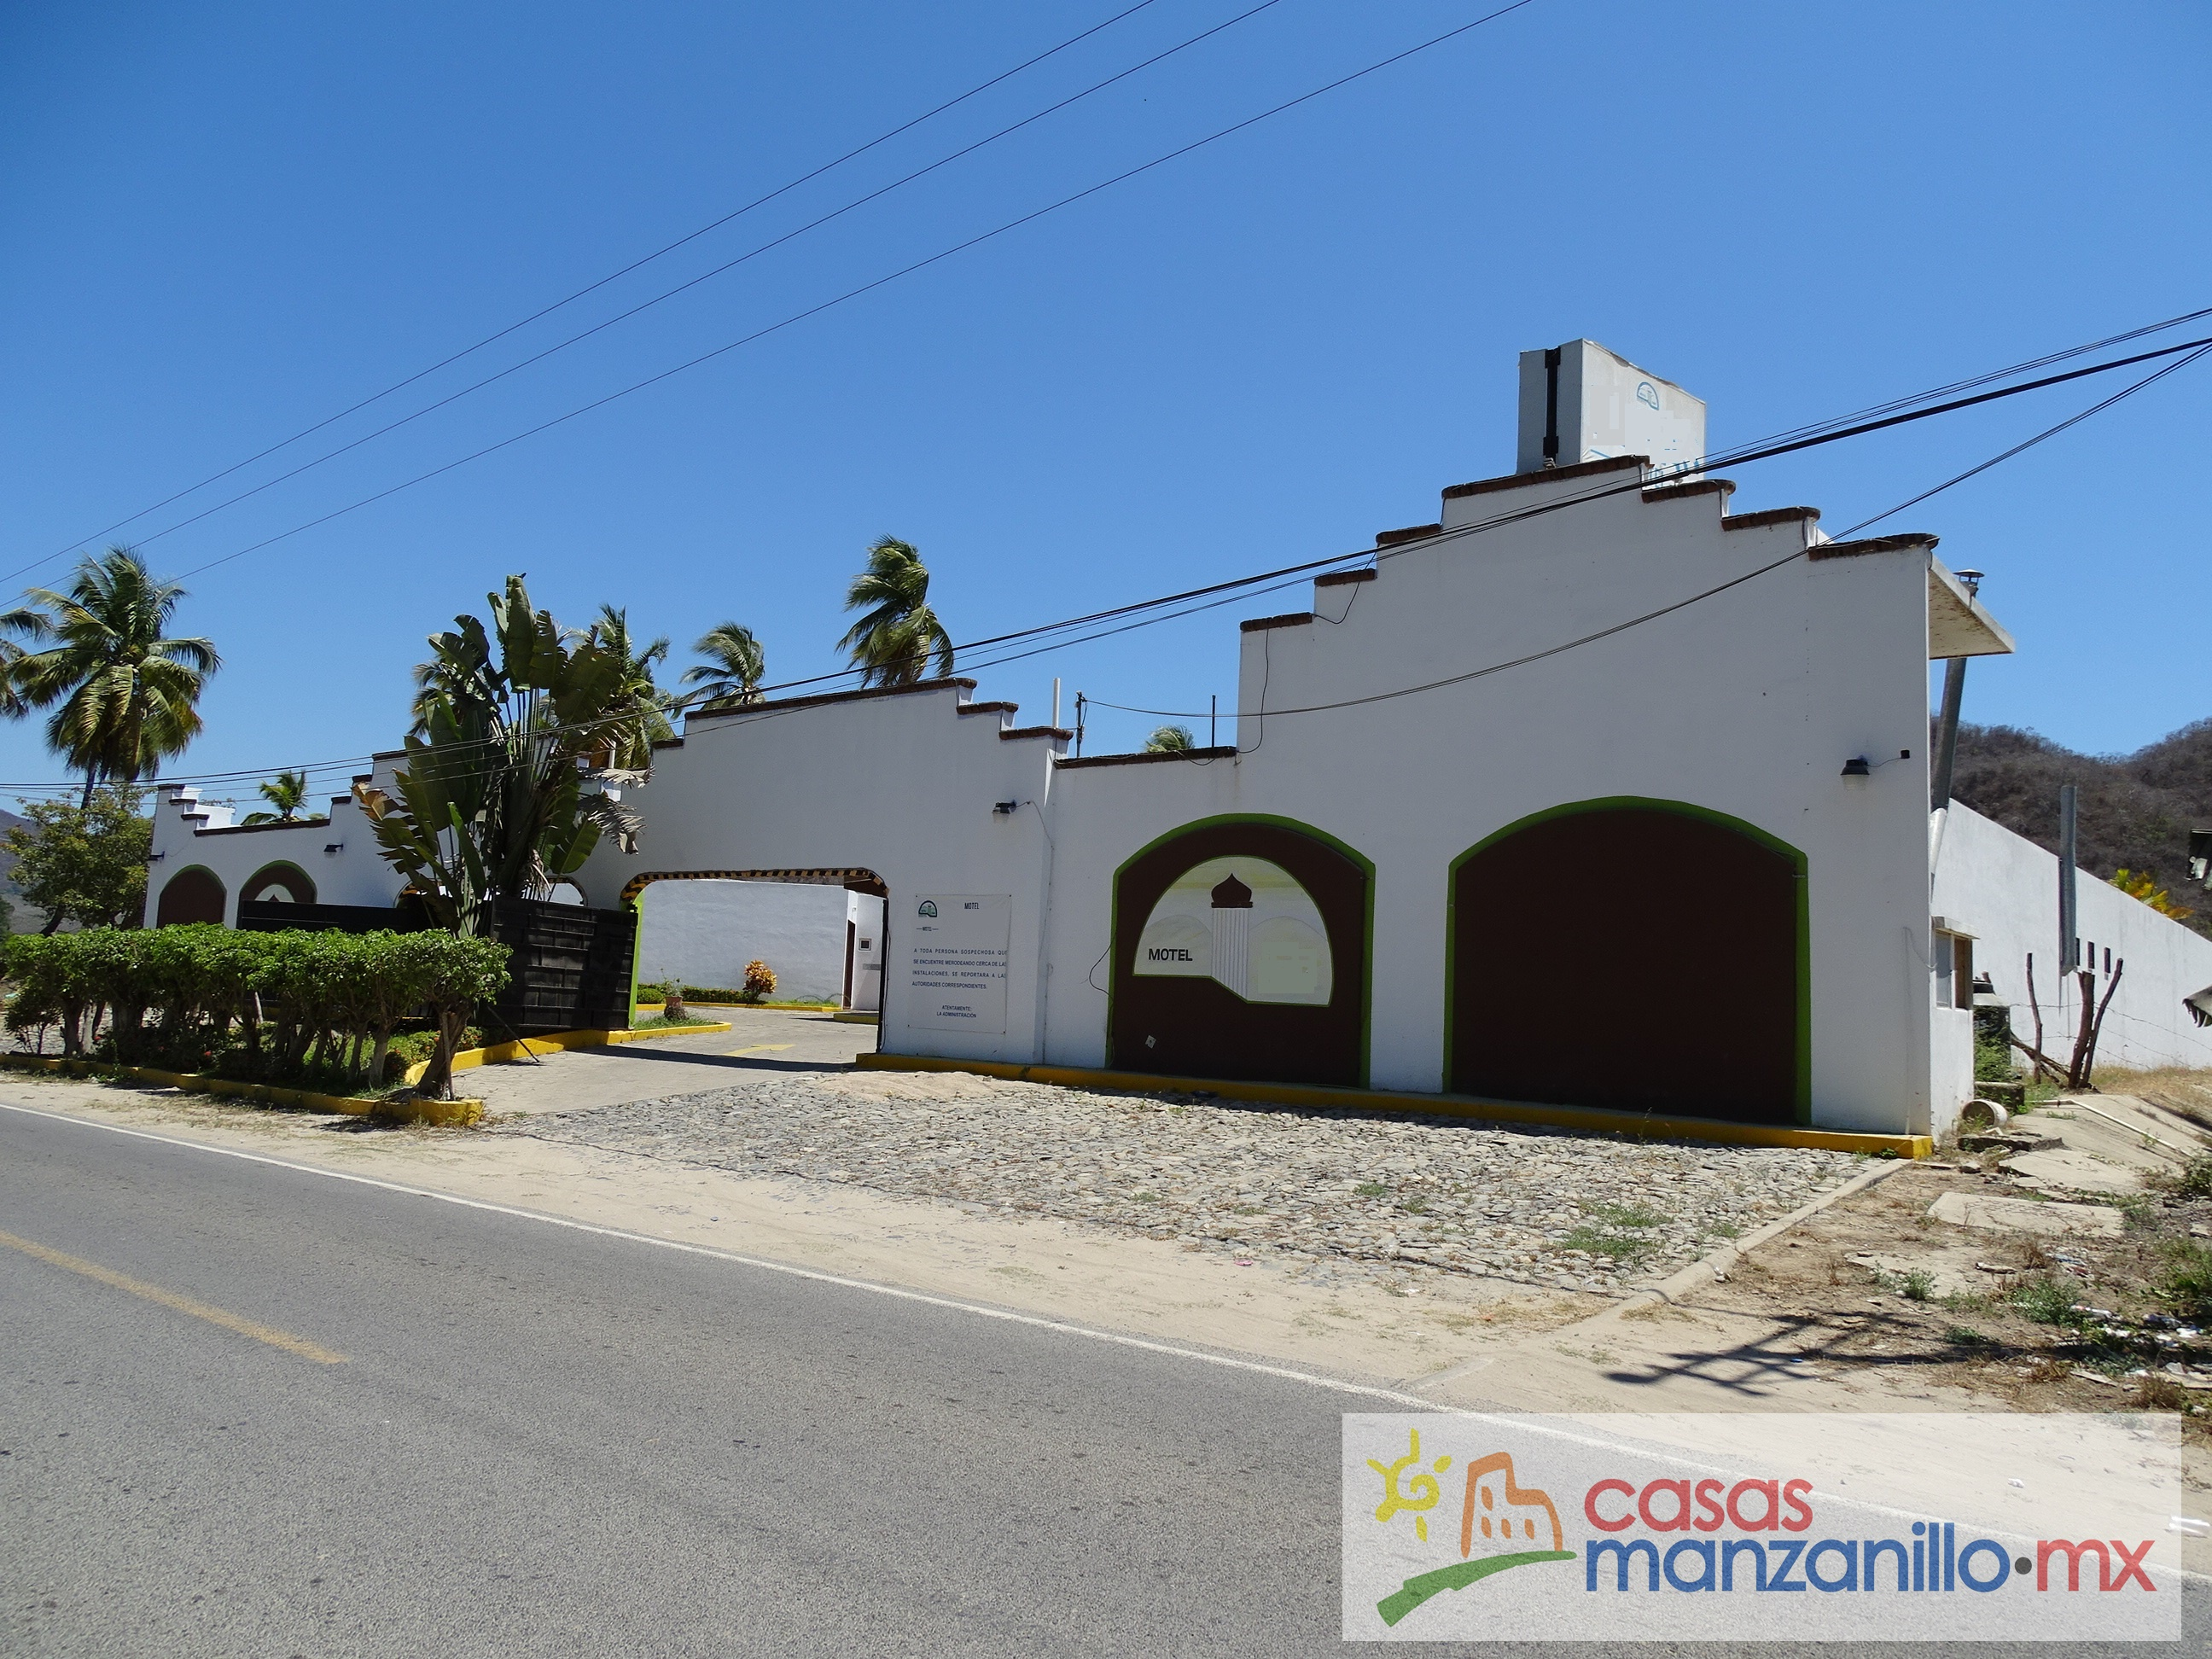 Motel VENTA Manzanillo - Dunas (14)